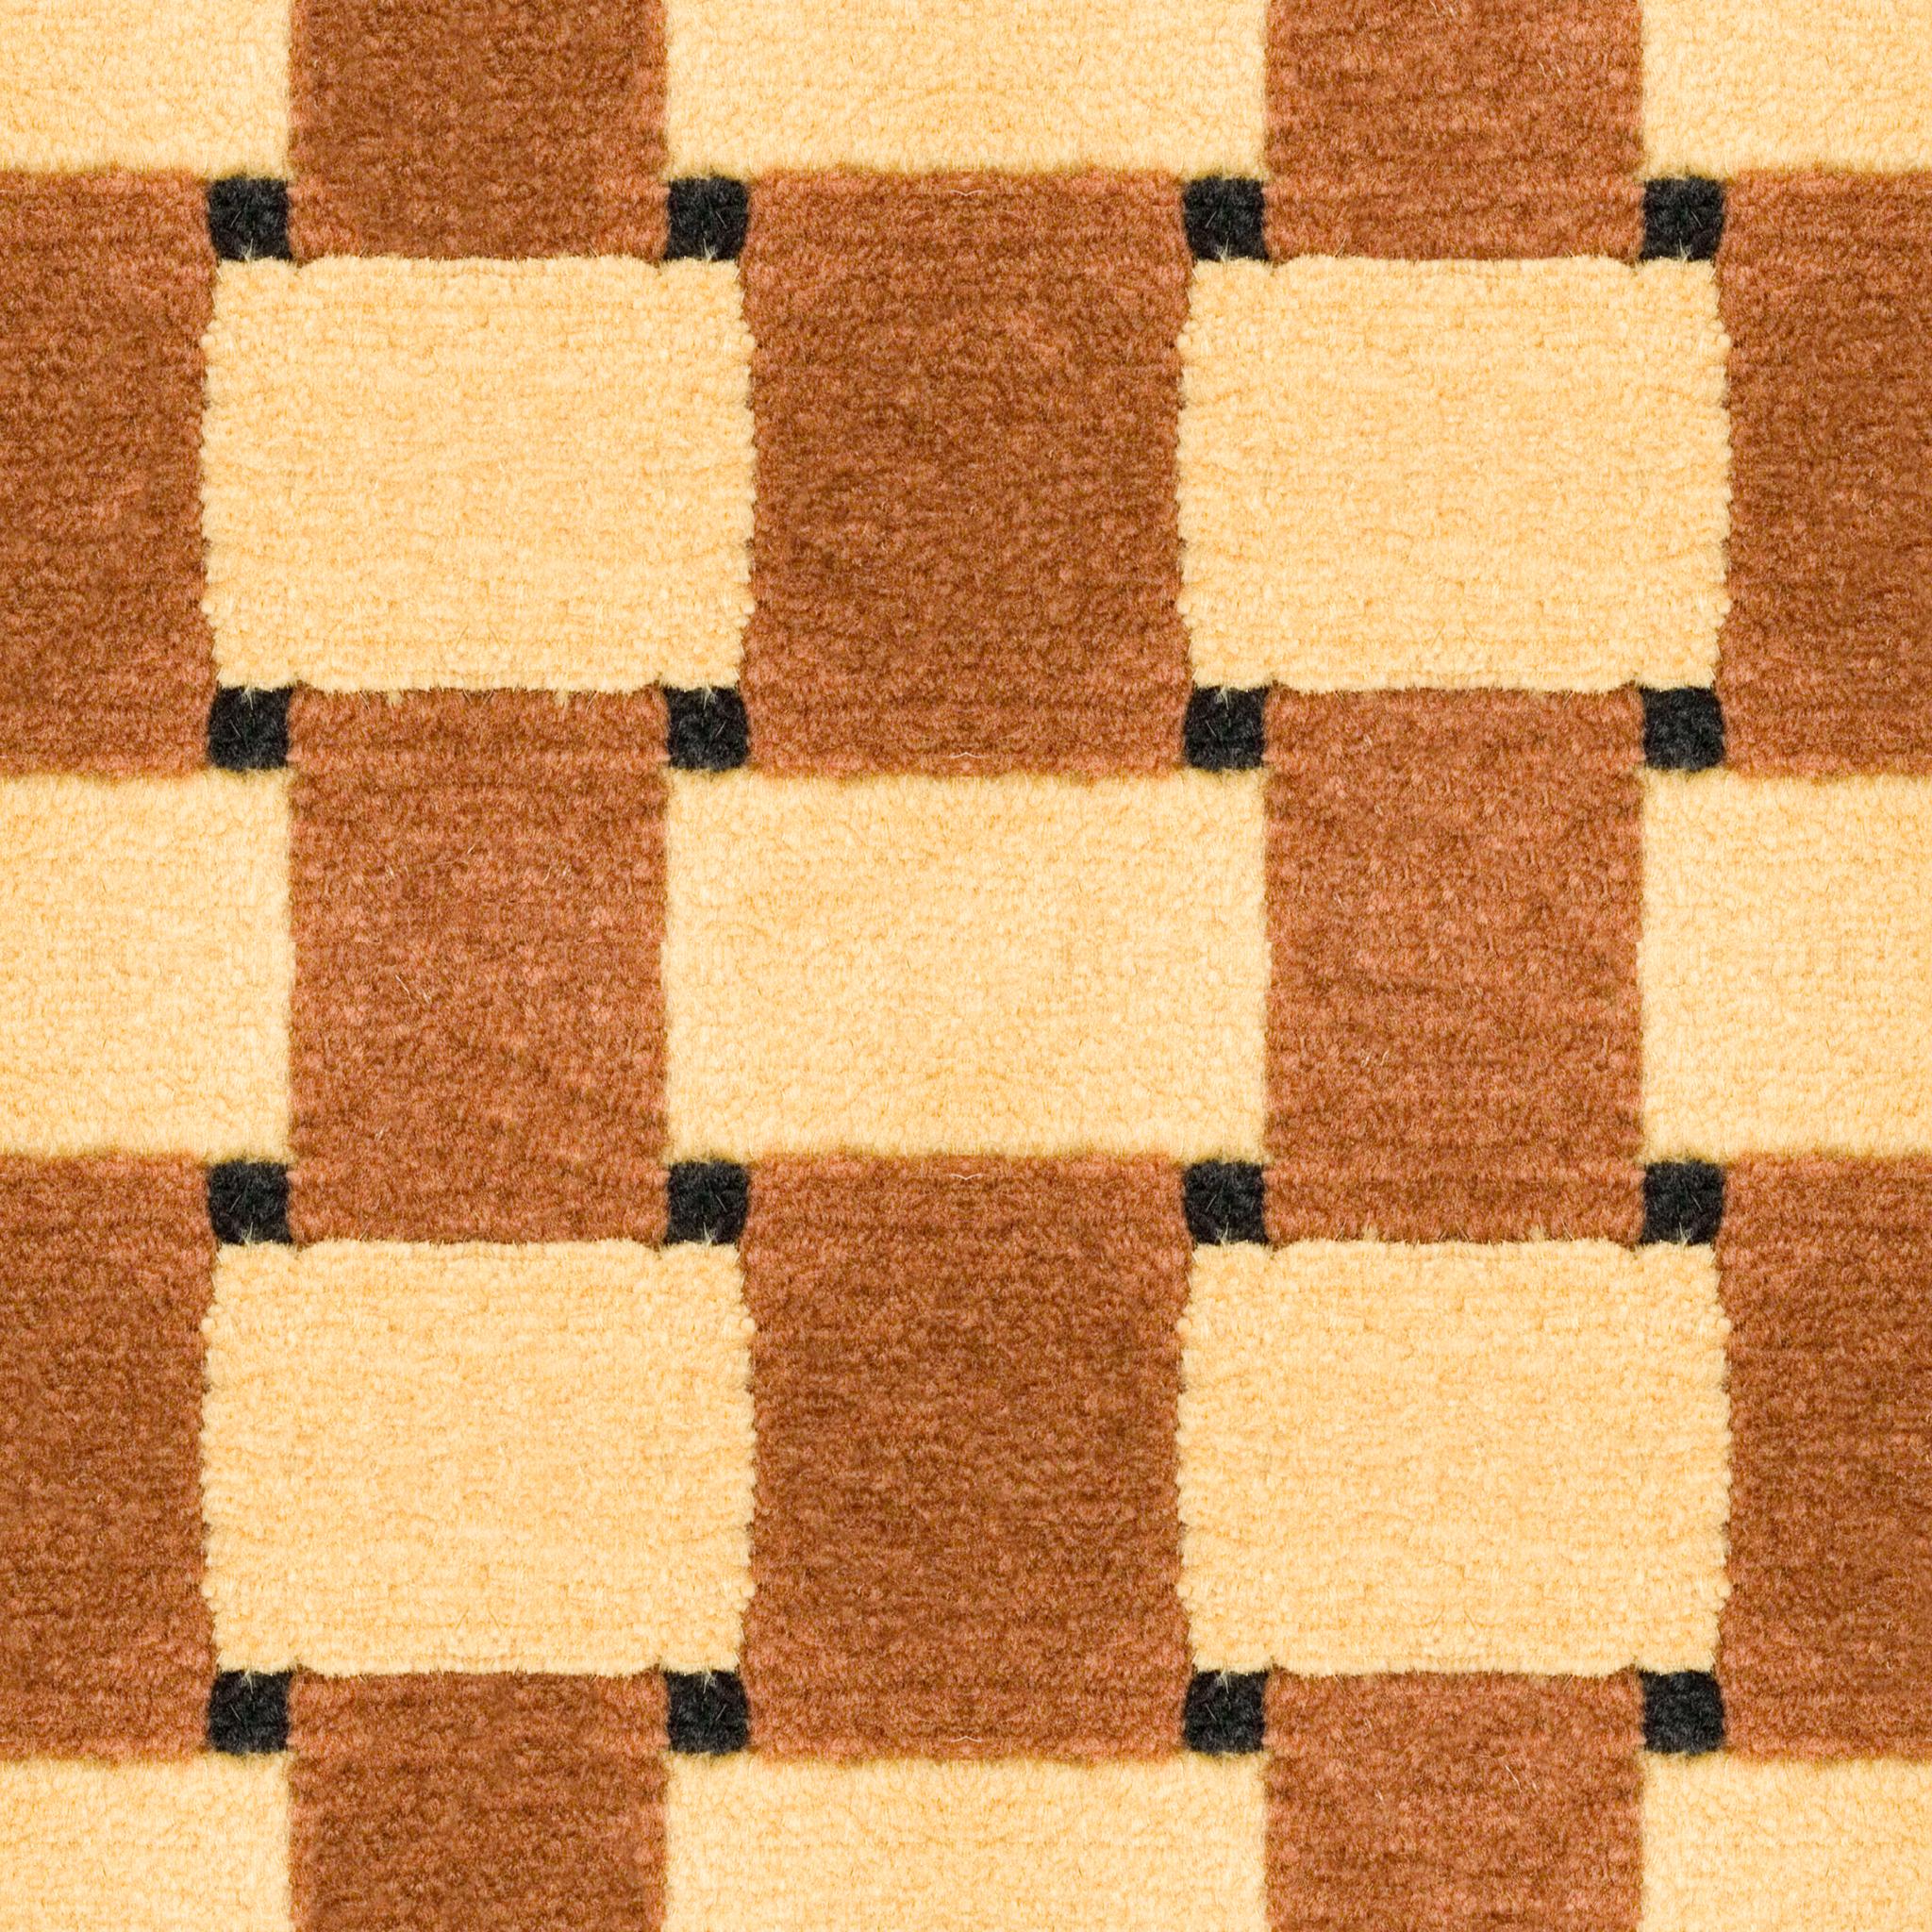 Brown Fence Carpet.jpg